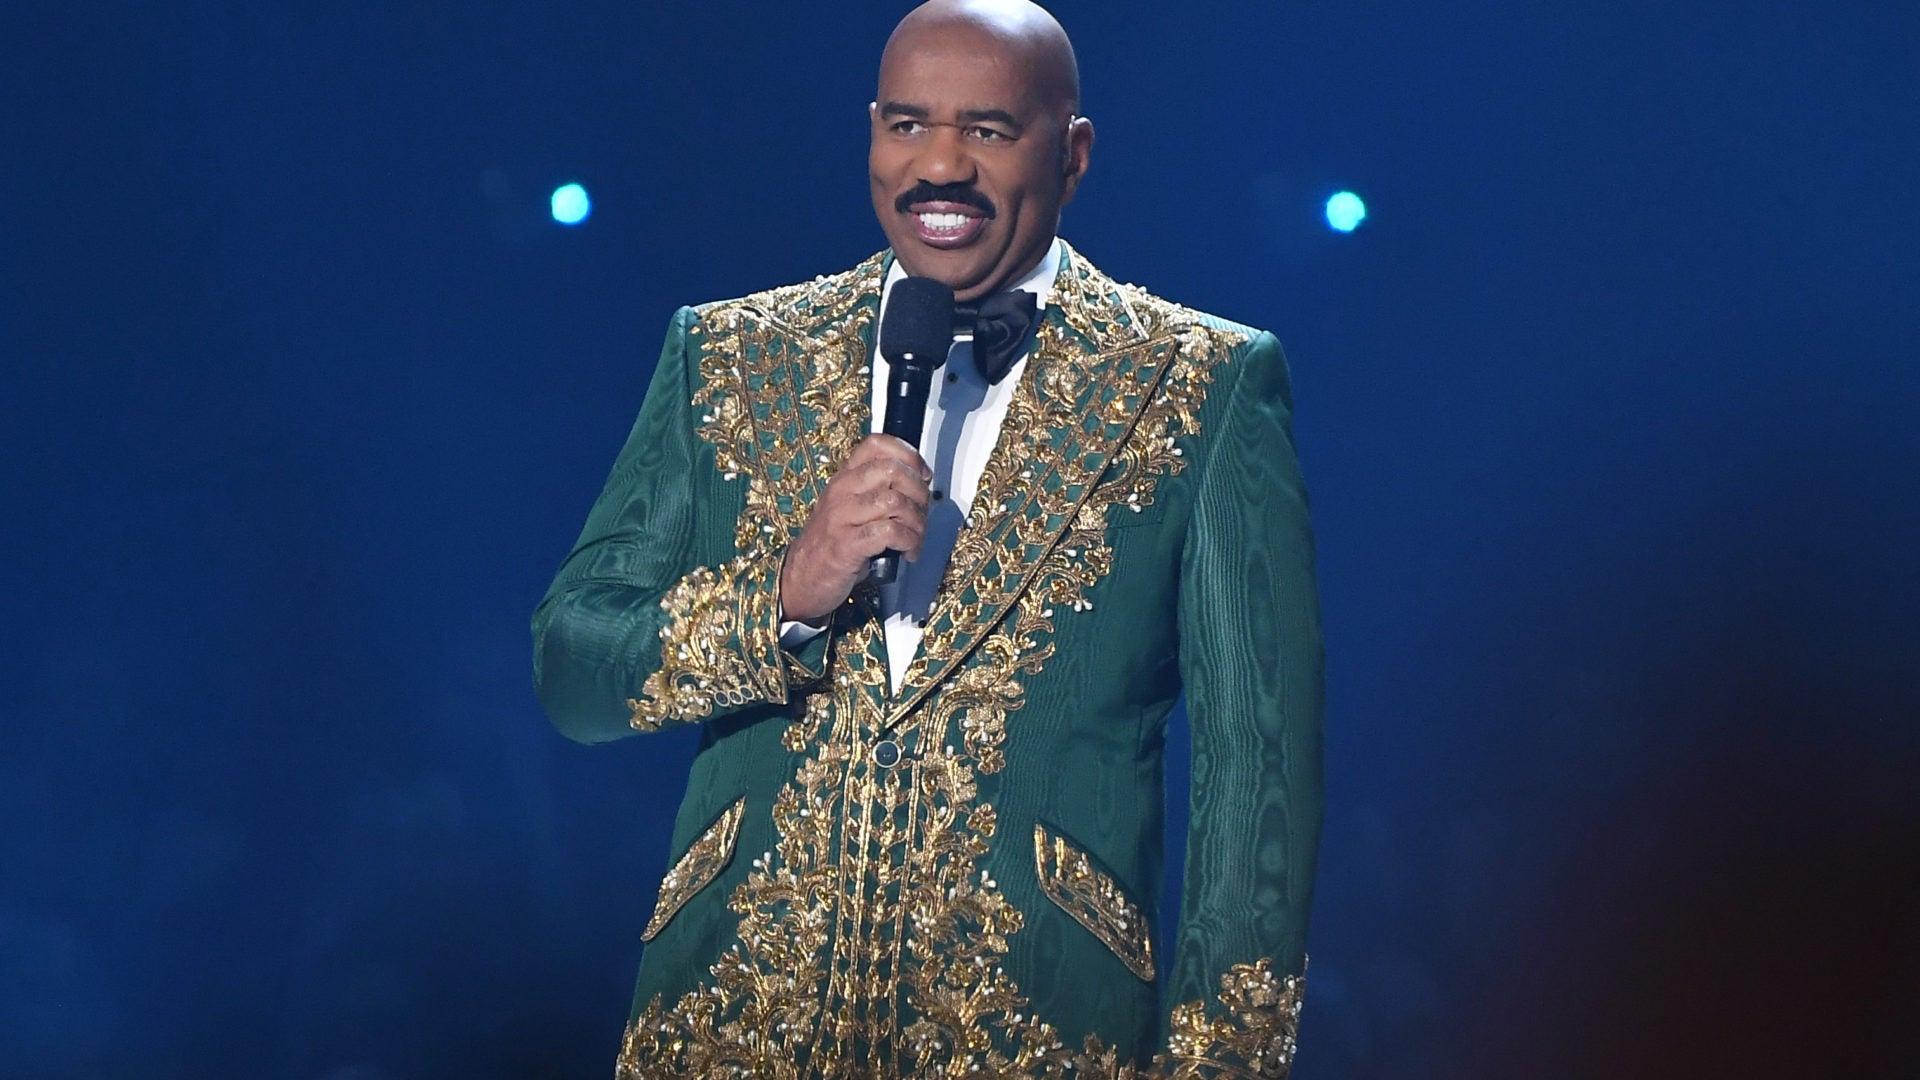 Steve Harvey Seemingly Mixes Up Names At Miss Universe Pageant Again